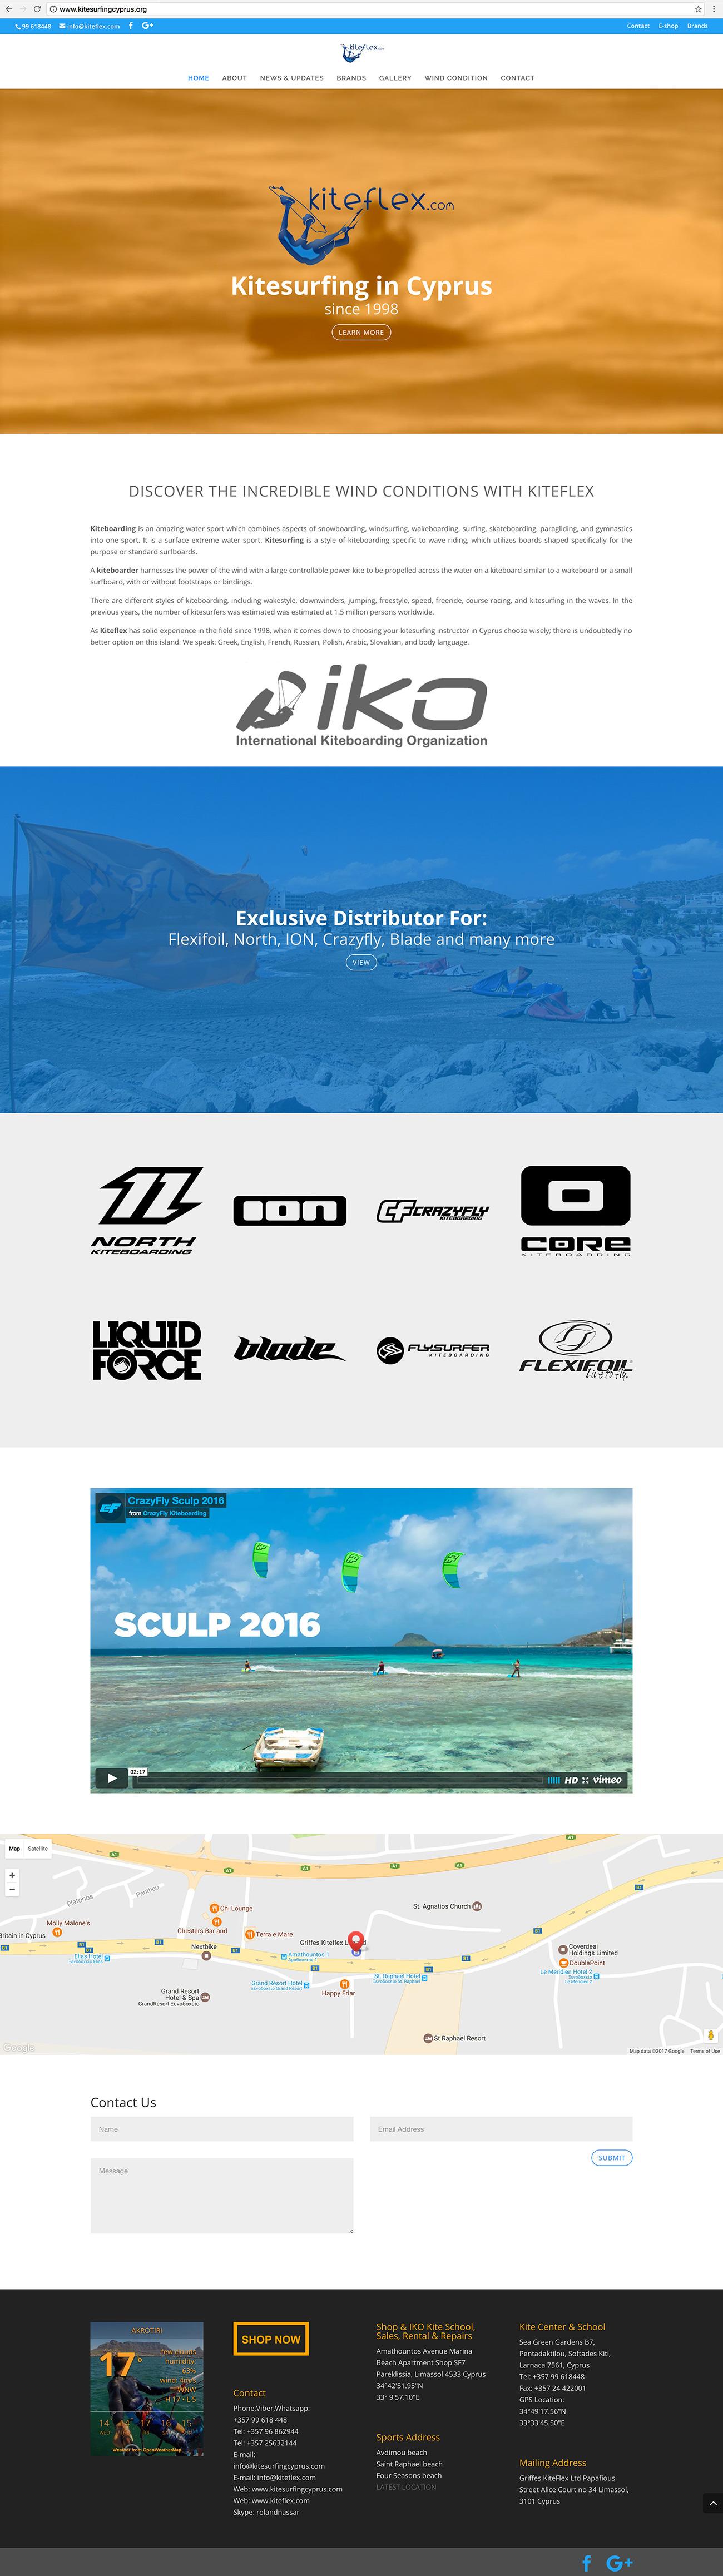 kitesurfing-cyprus-web-design-and-seo-search-engine-optimization